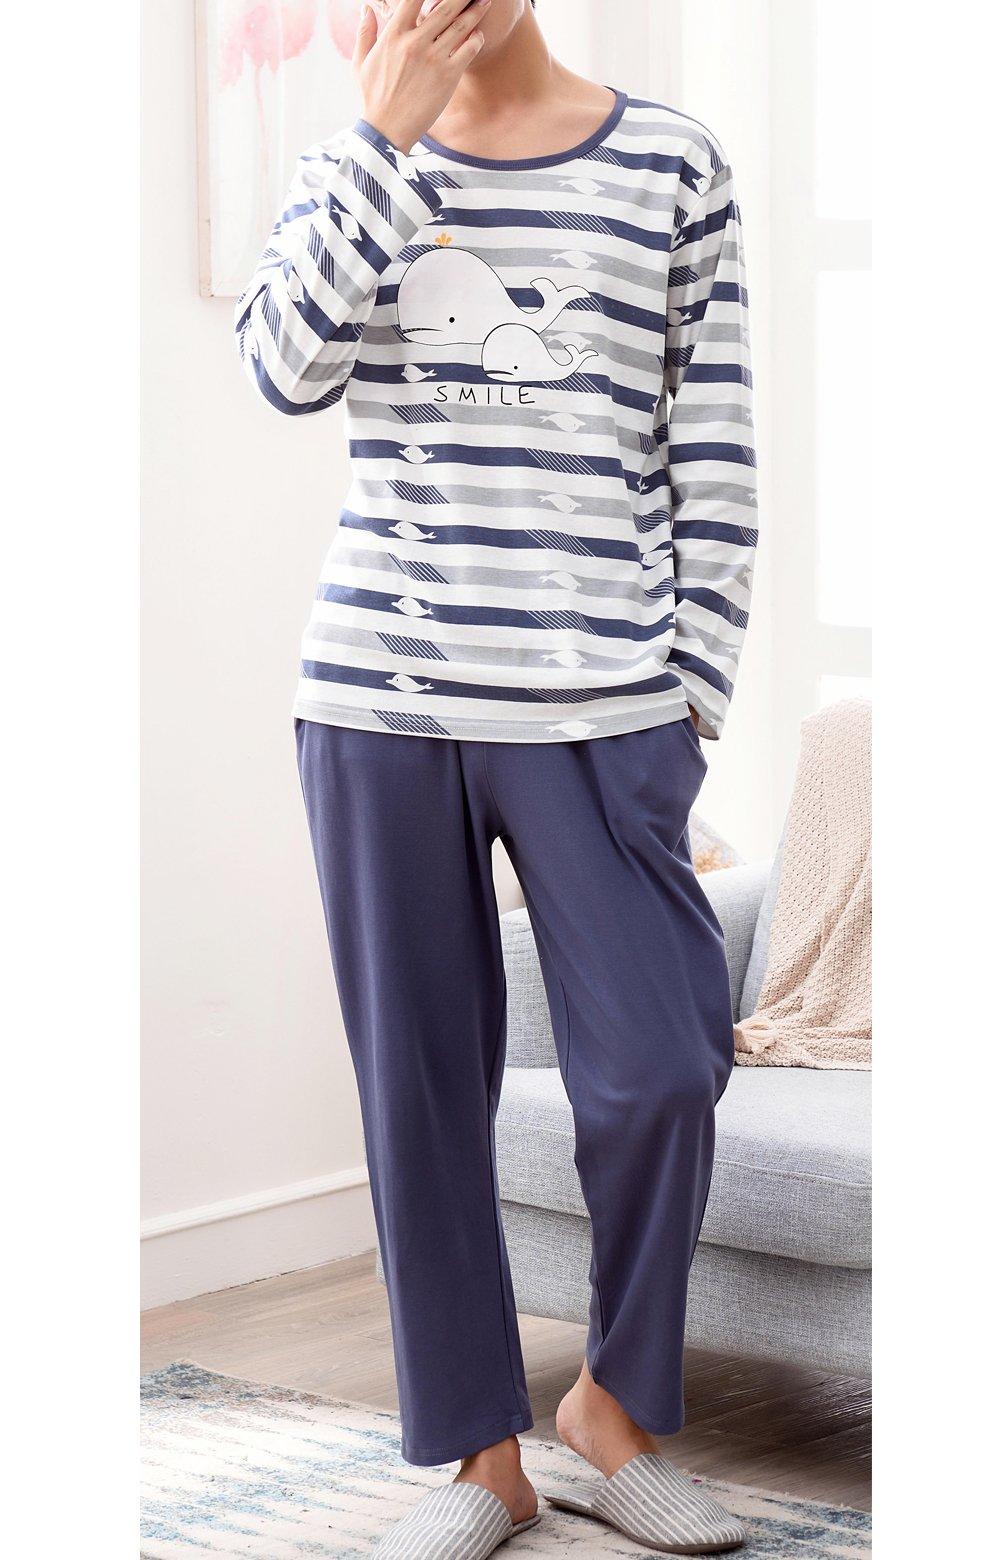 BYX SweetLeisure Big Boys Loose Cute Cotton Pajamas Leisure Wear 10-16 Years by BYX SweetLeisure (Image #3)